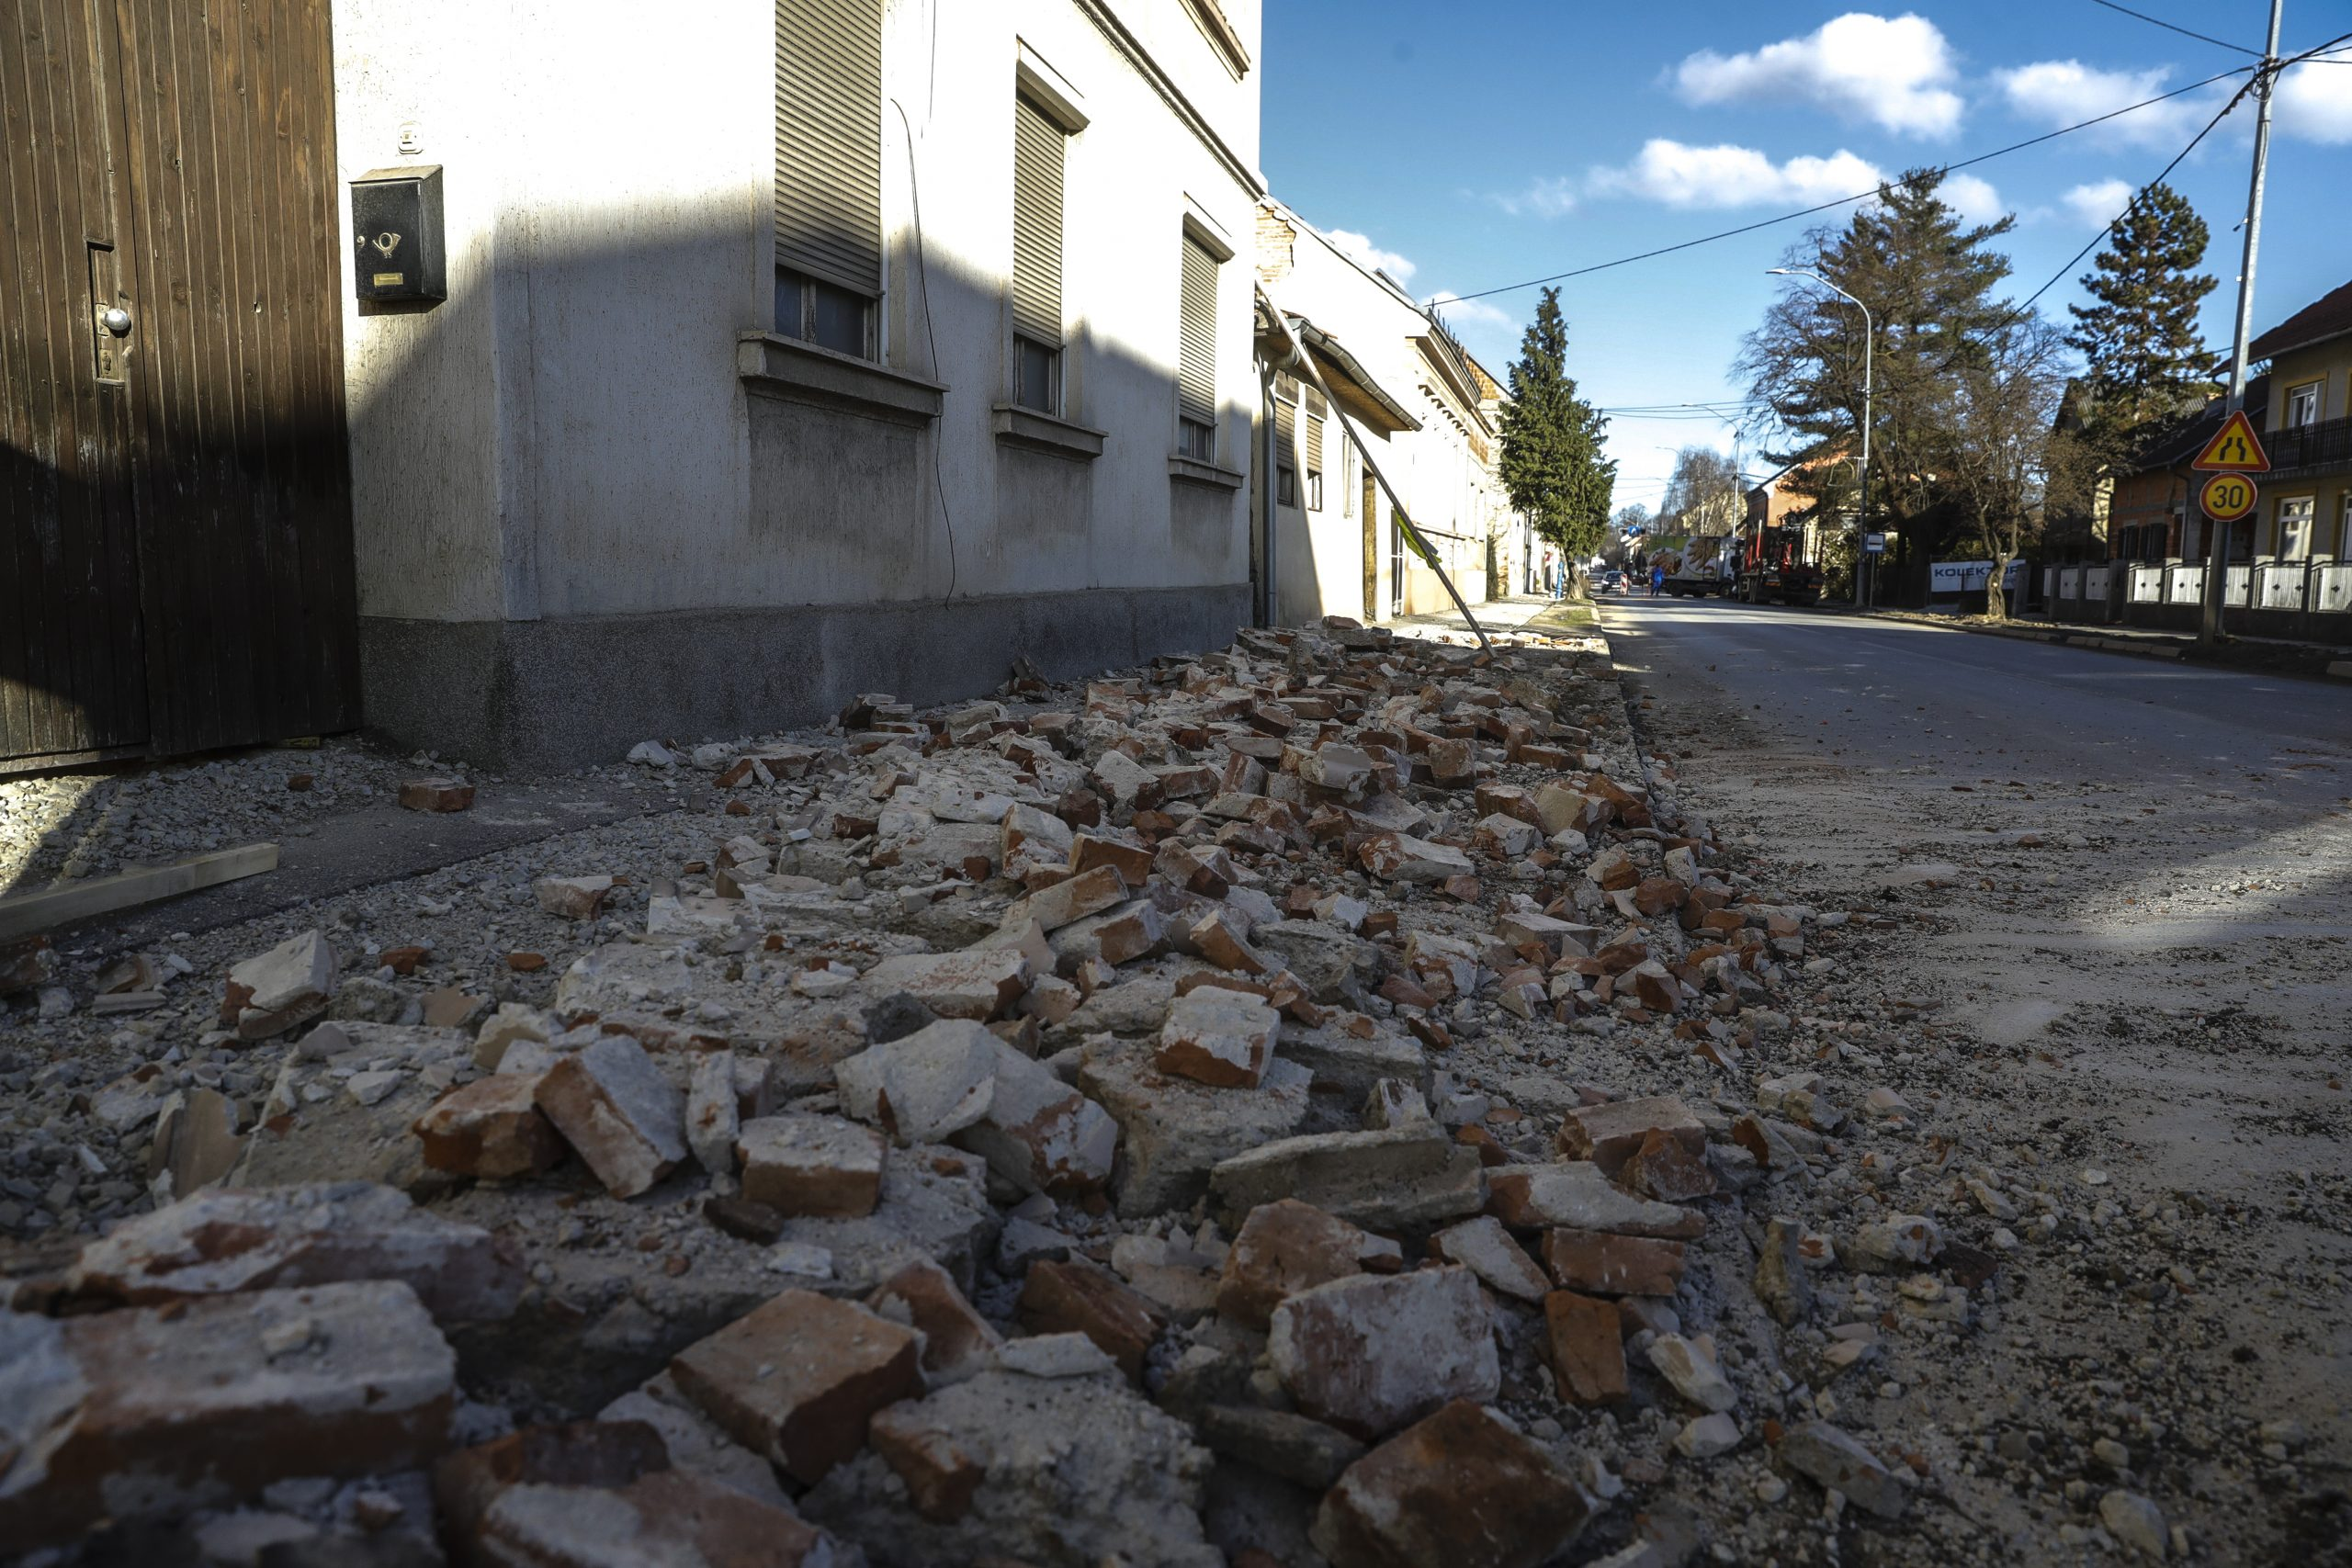 Zemljotres magnitude 3 po Rihteru osetio se jutros na području Petrinje 1